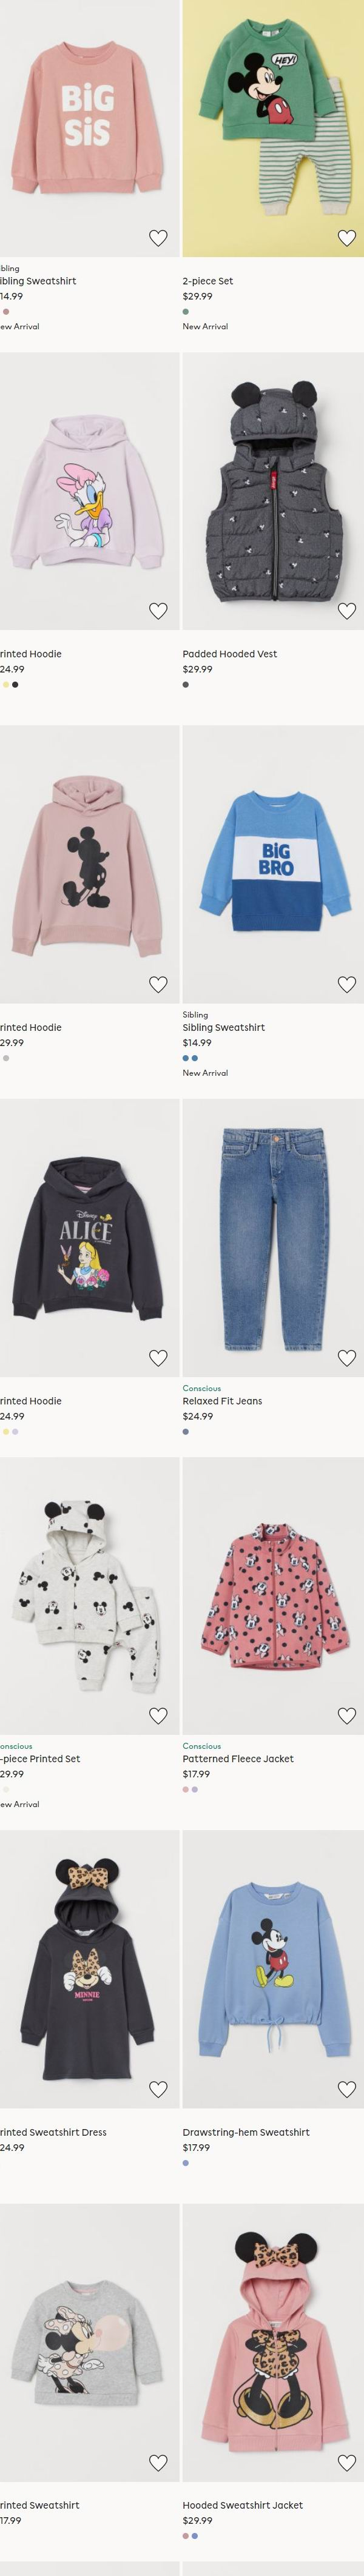 H&M 迪士尼 米奇米妮系列儿童夹克、卫衣、毛衣、套头衫 17.99加元起